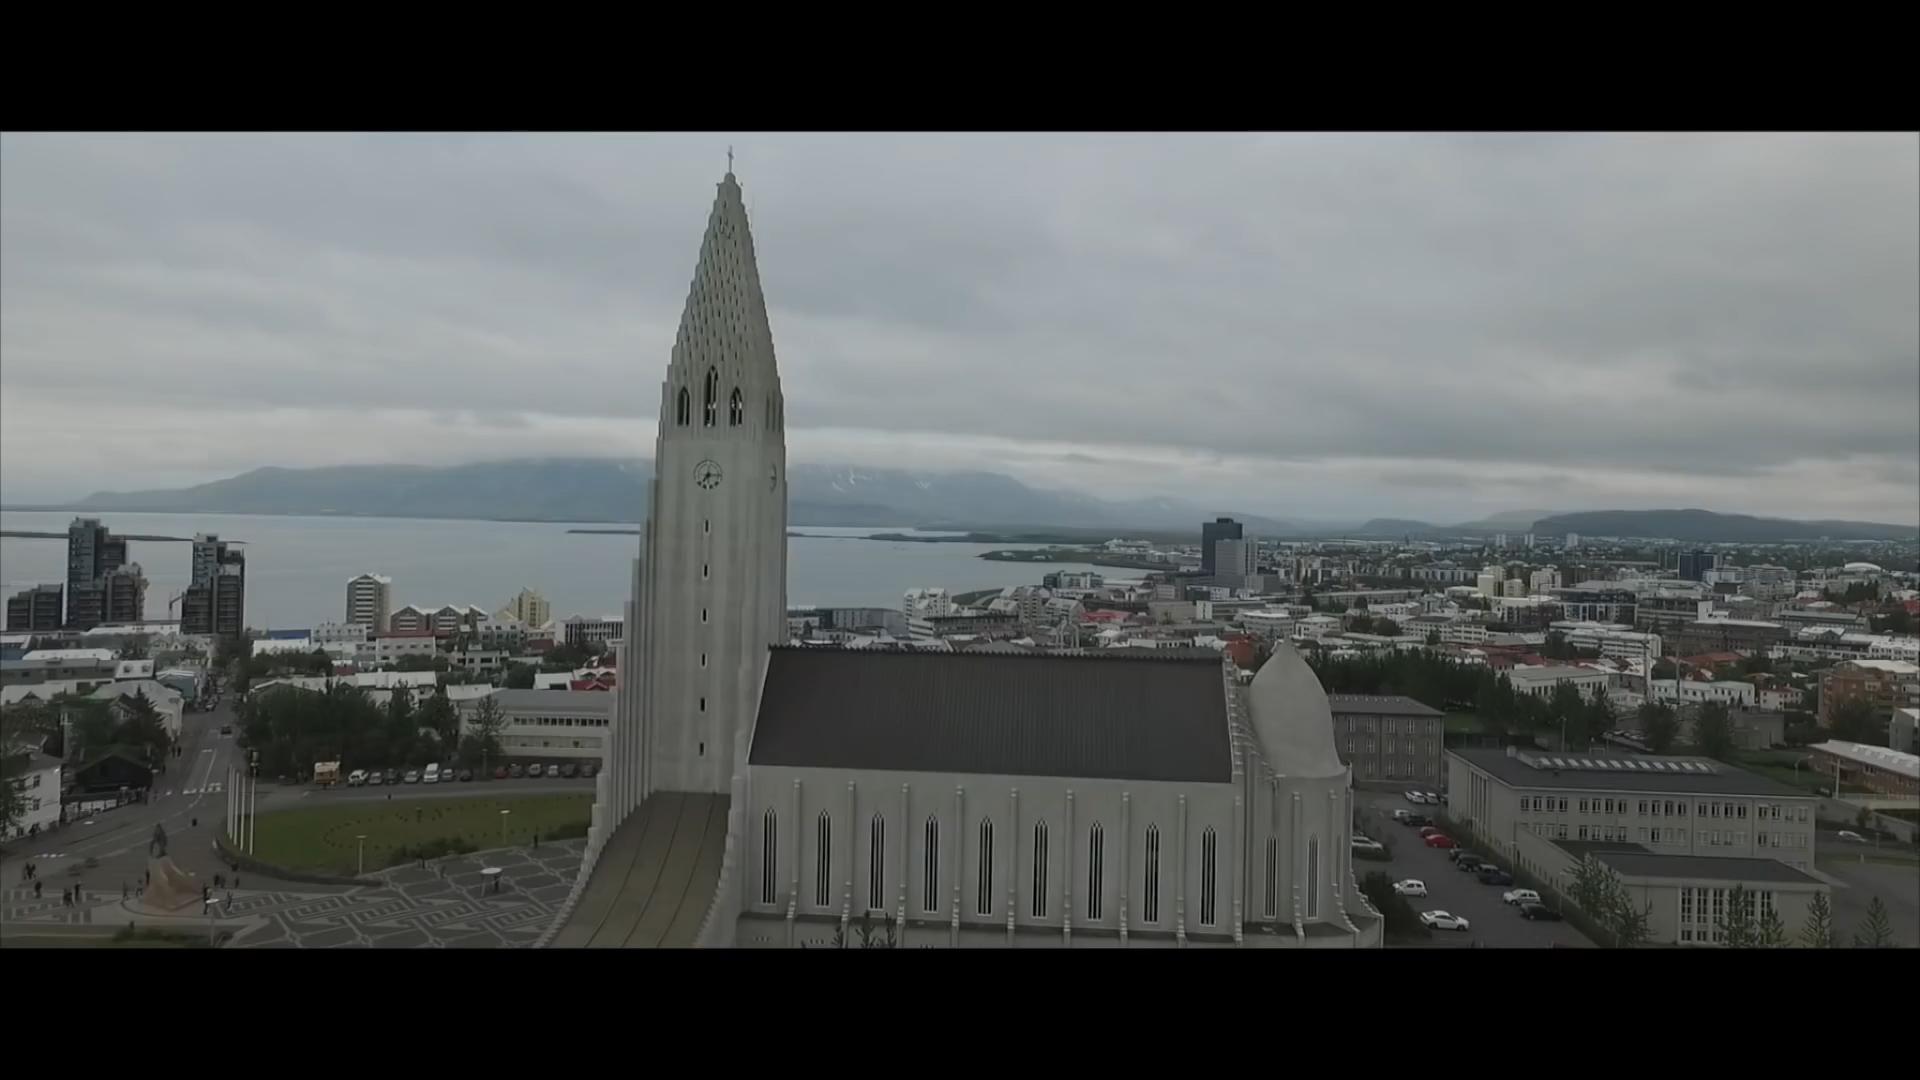 jim-west-central-church-of-iceland-landscape